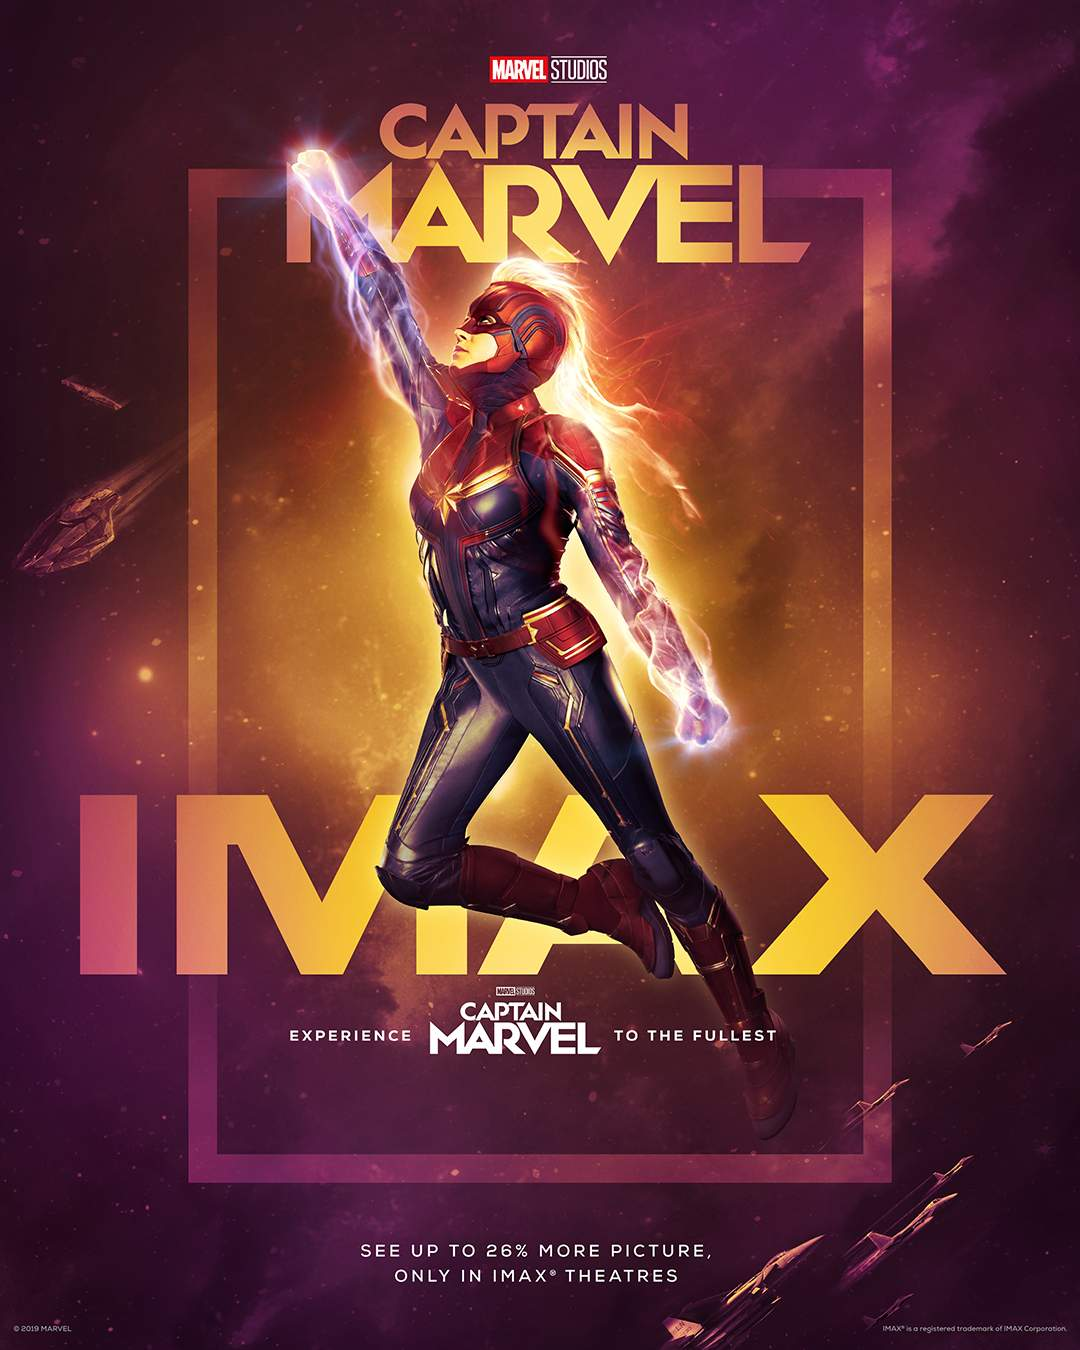 Das IMAX-Plakat von Captain Marvel